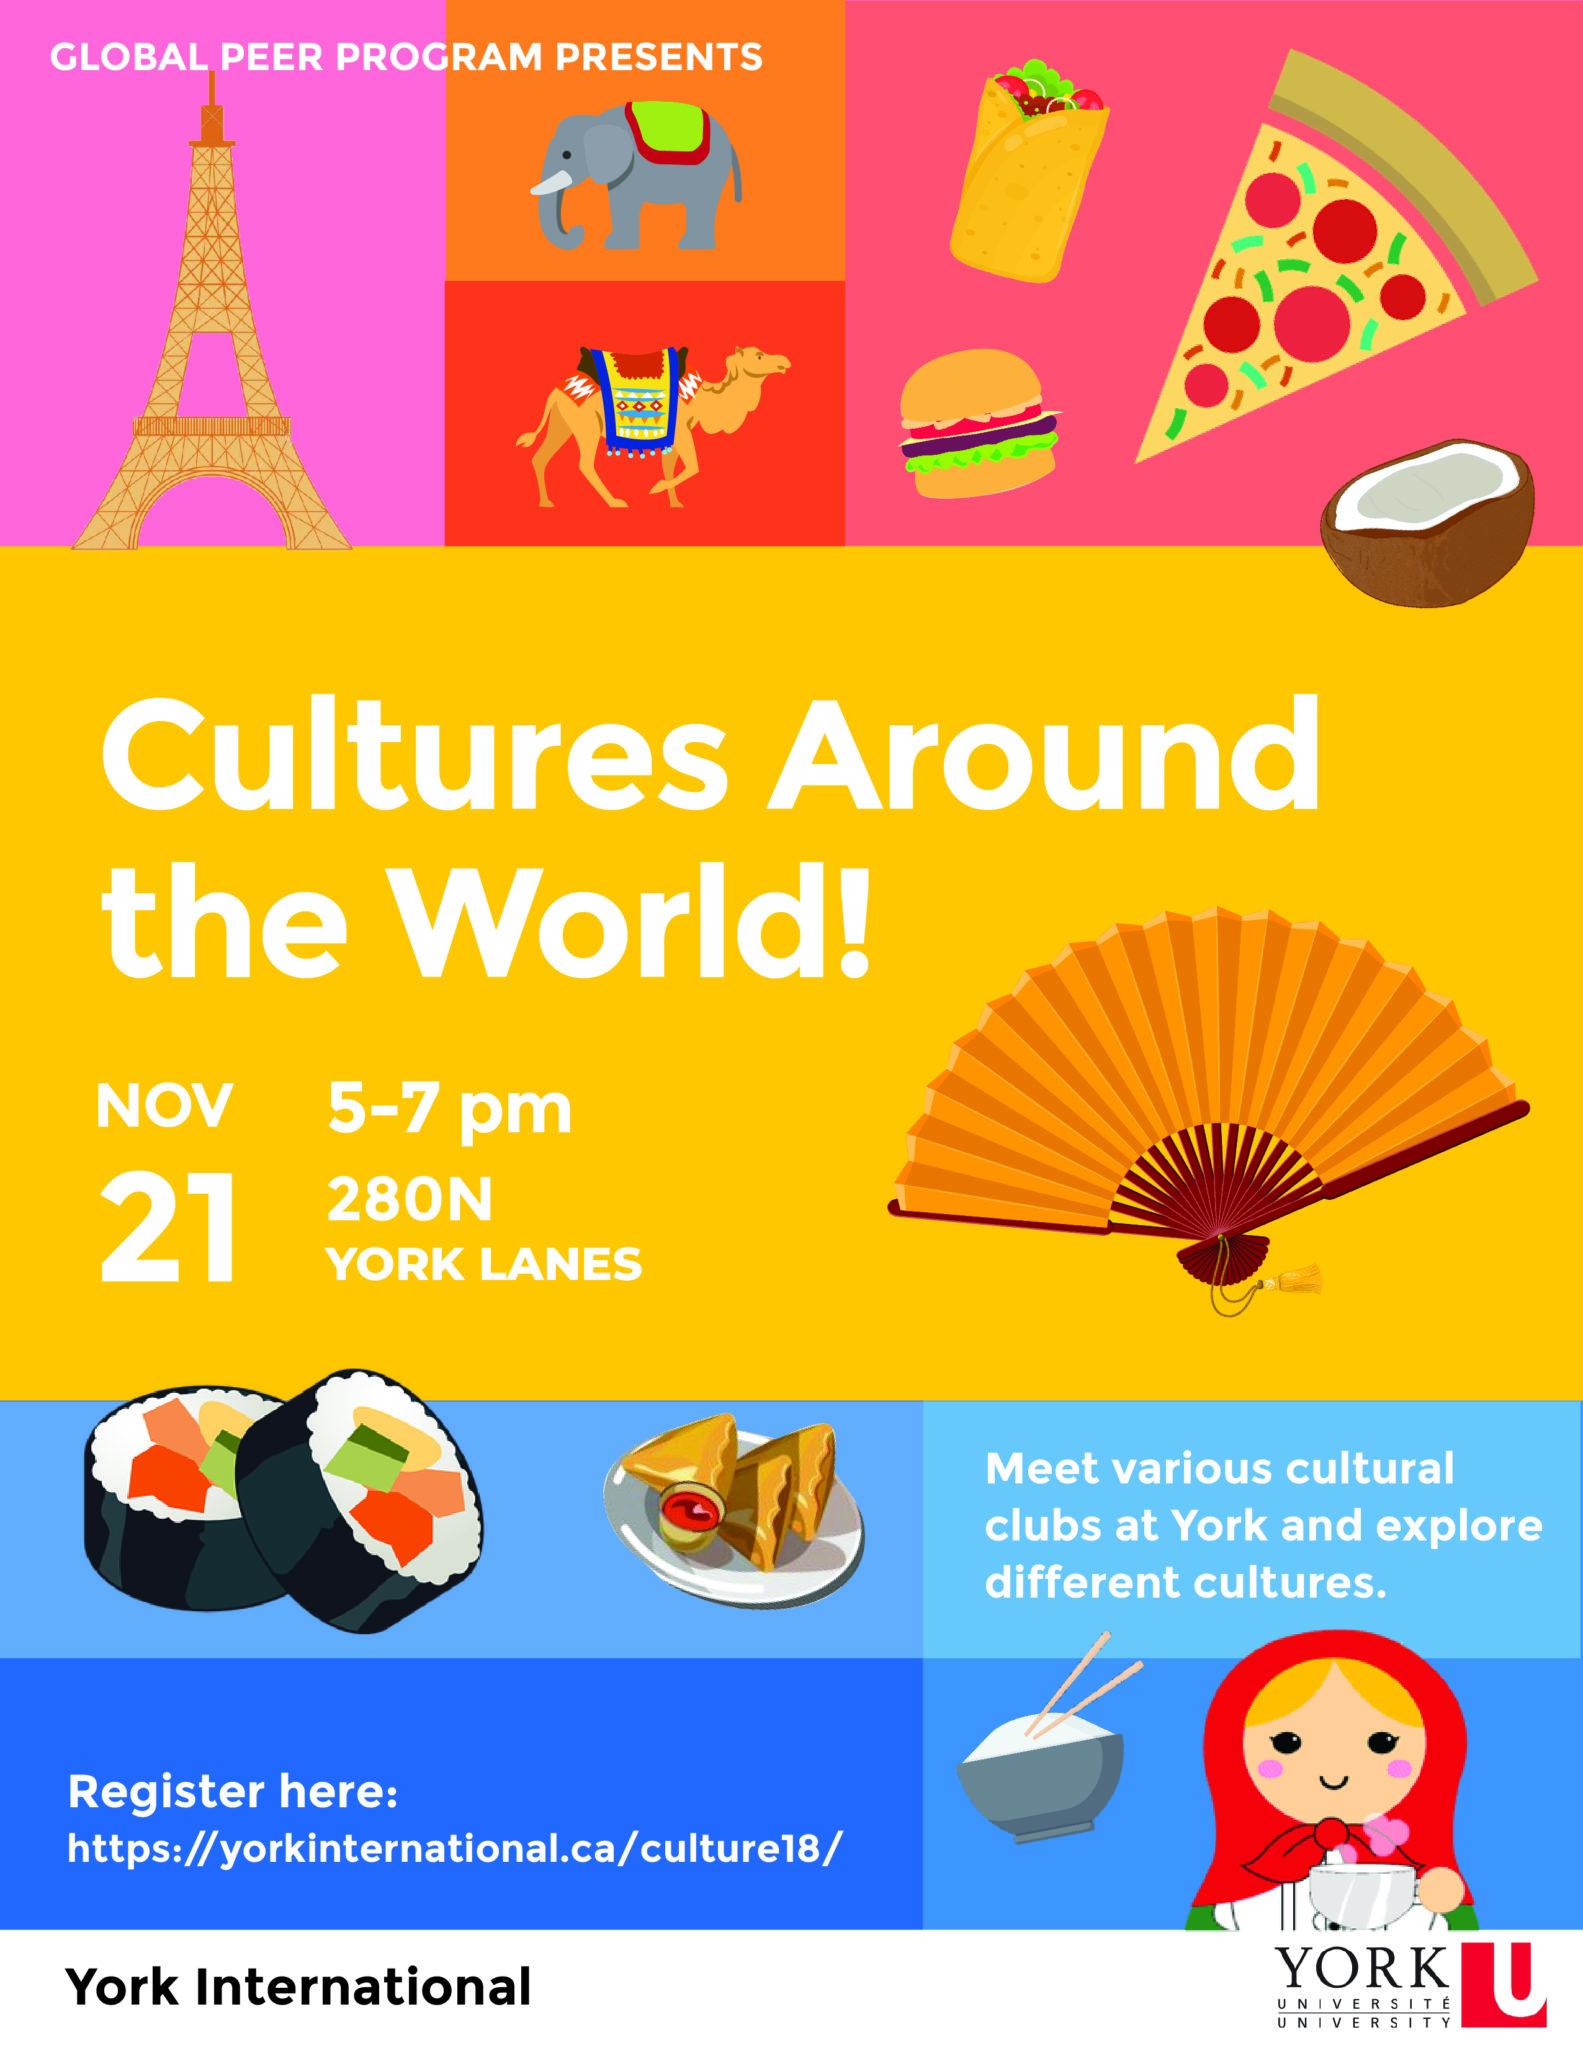 "Global Peer Program presents ""Cultures Around the World!"" @ 280N York Lanes"